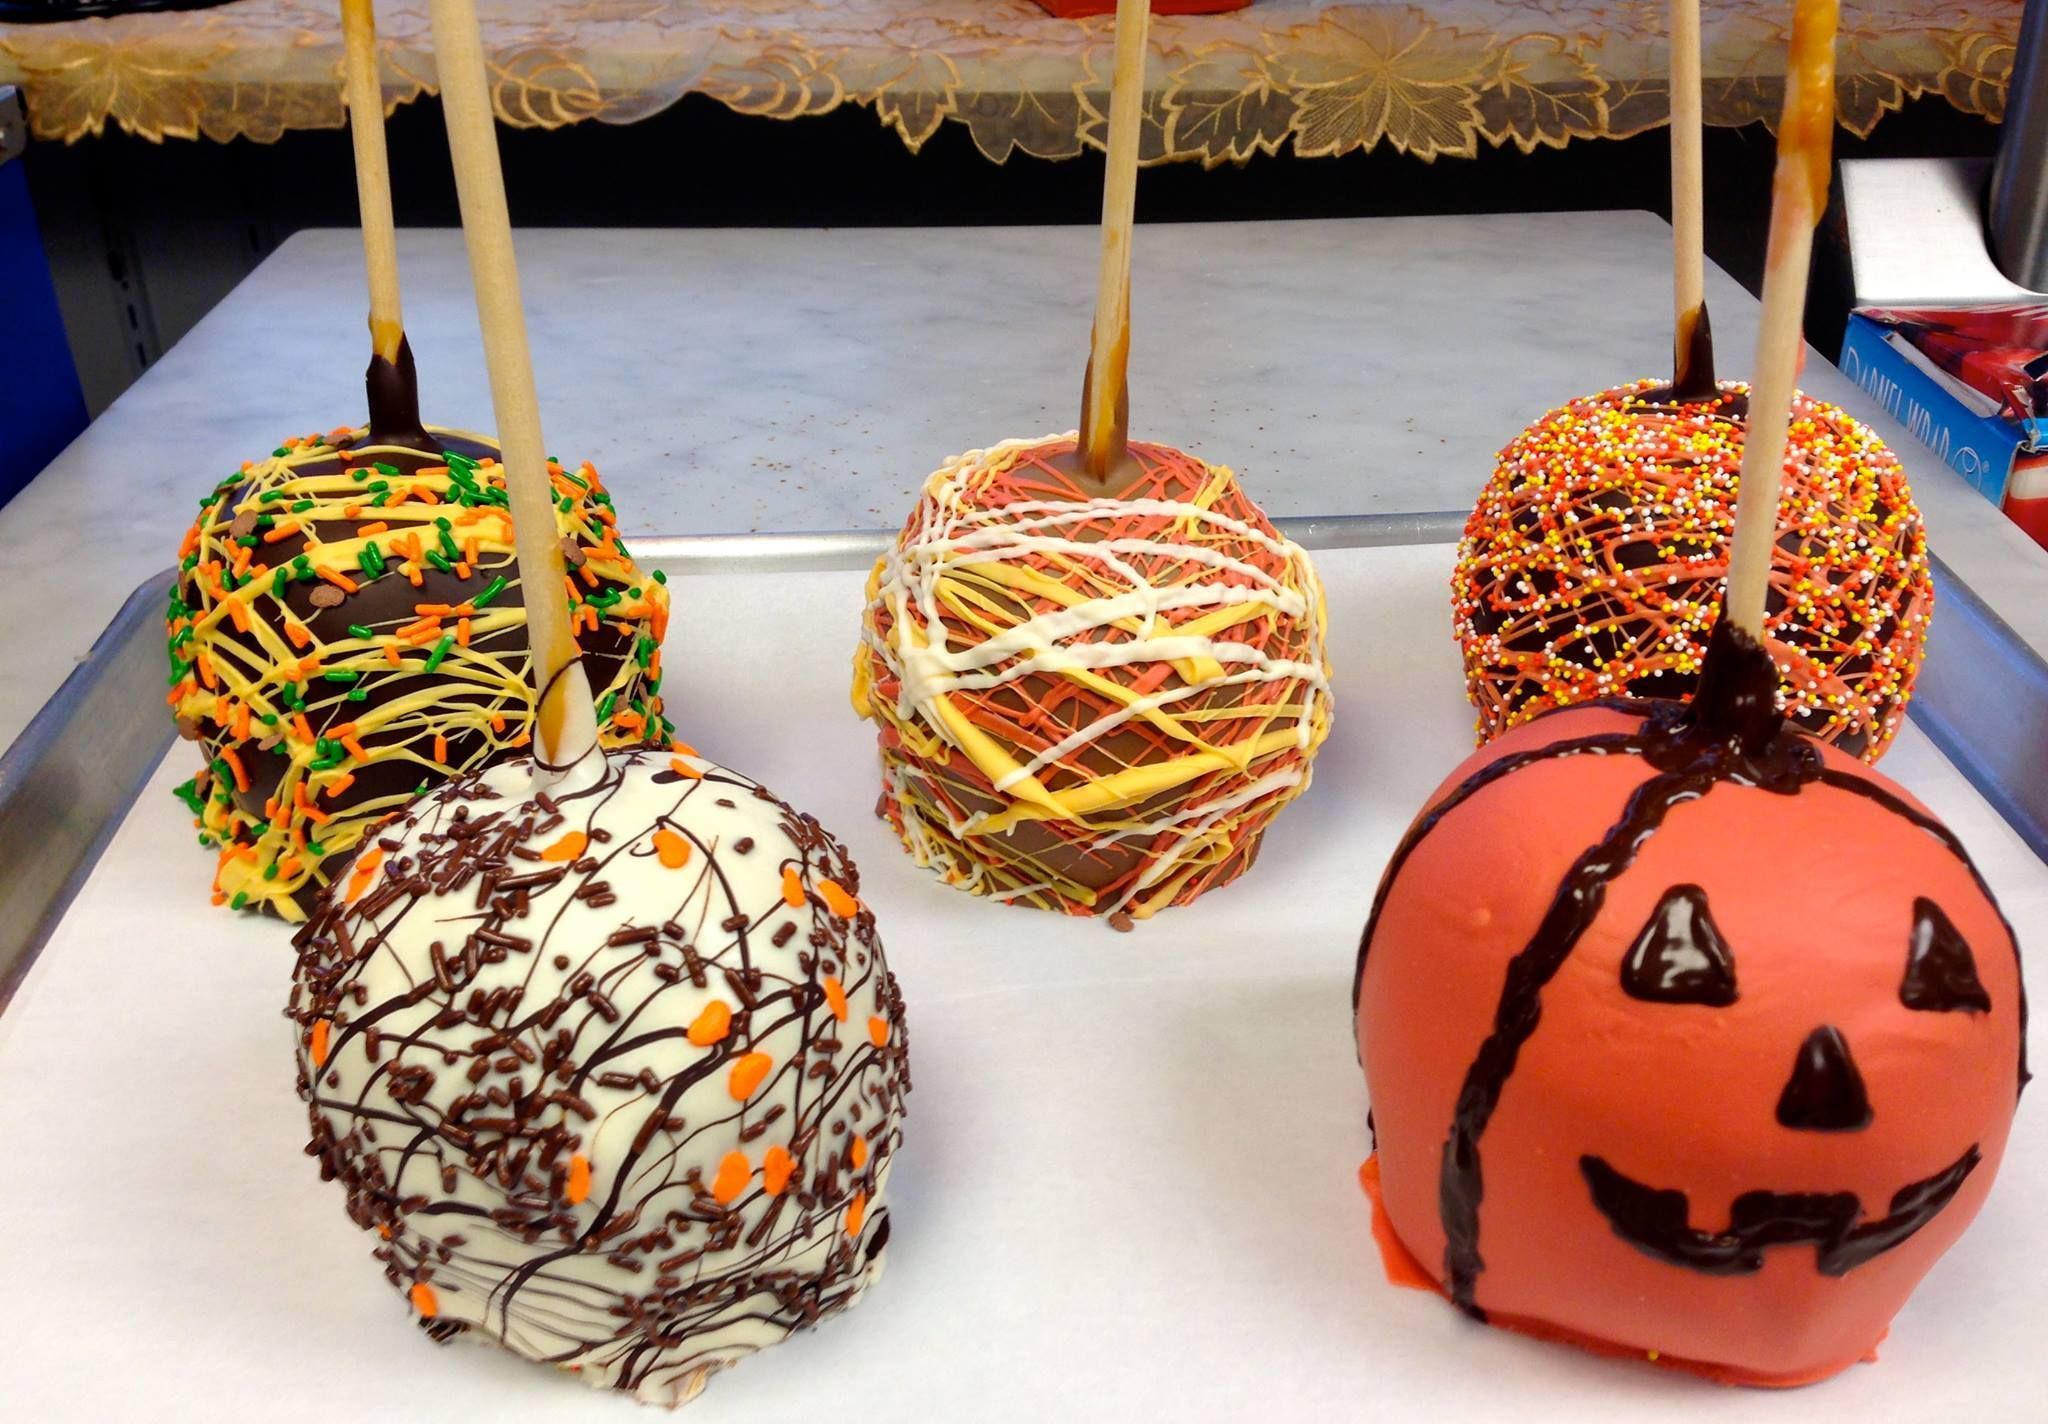 Decorated Caramel Apples for Halloween! Caramel apples